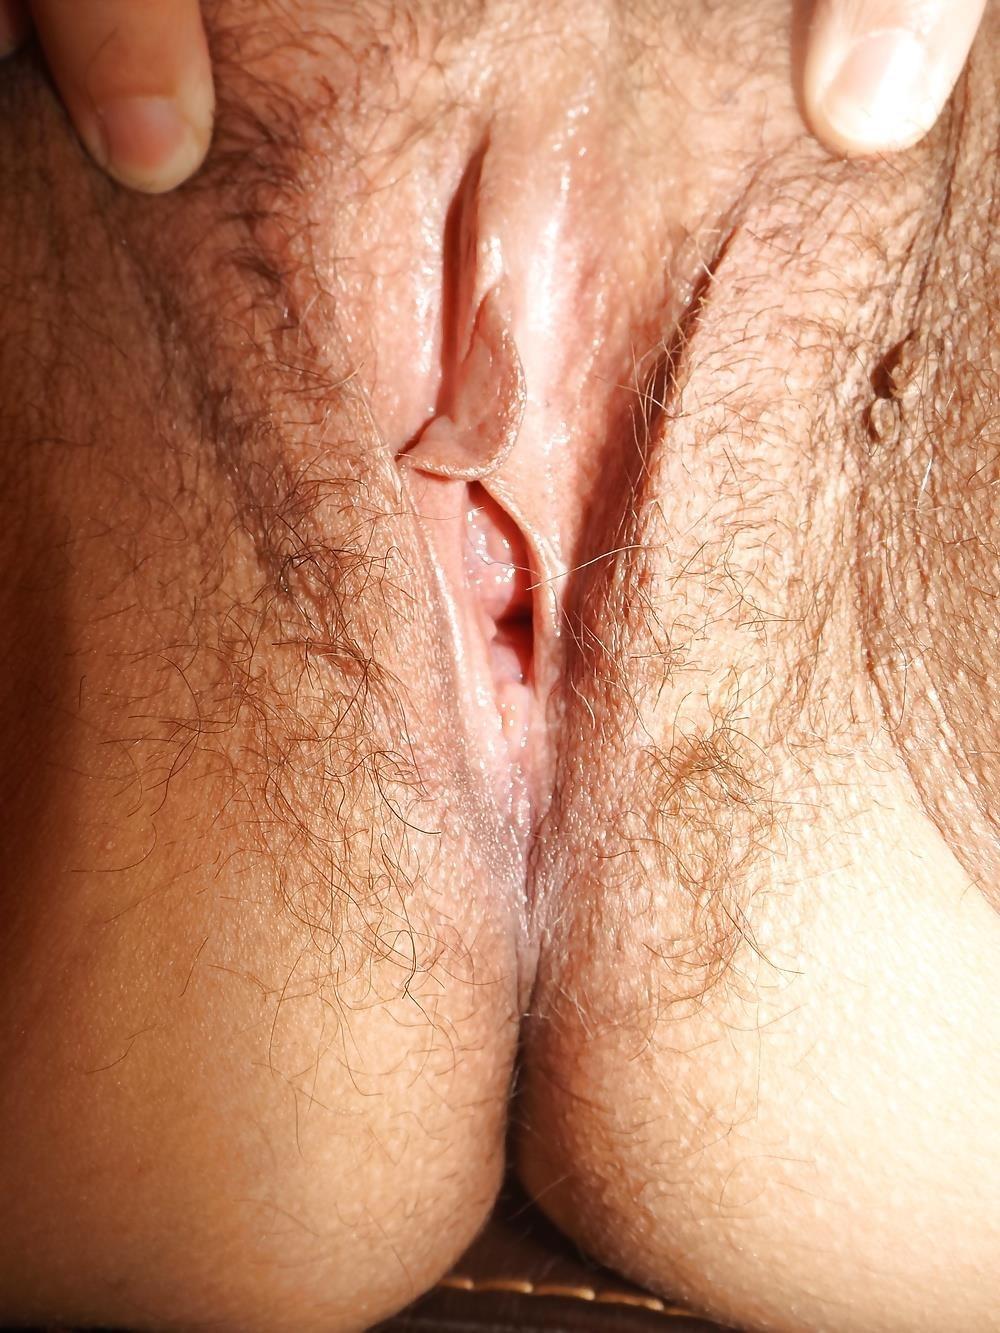 Xnxx boobs anal-8747